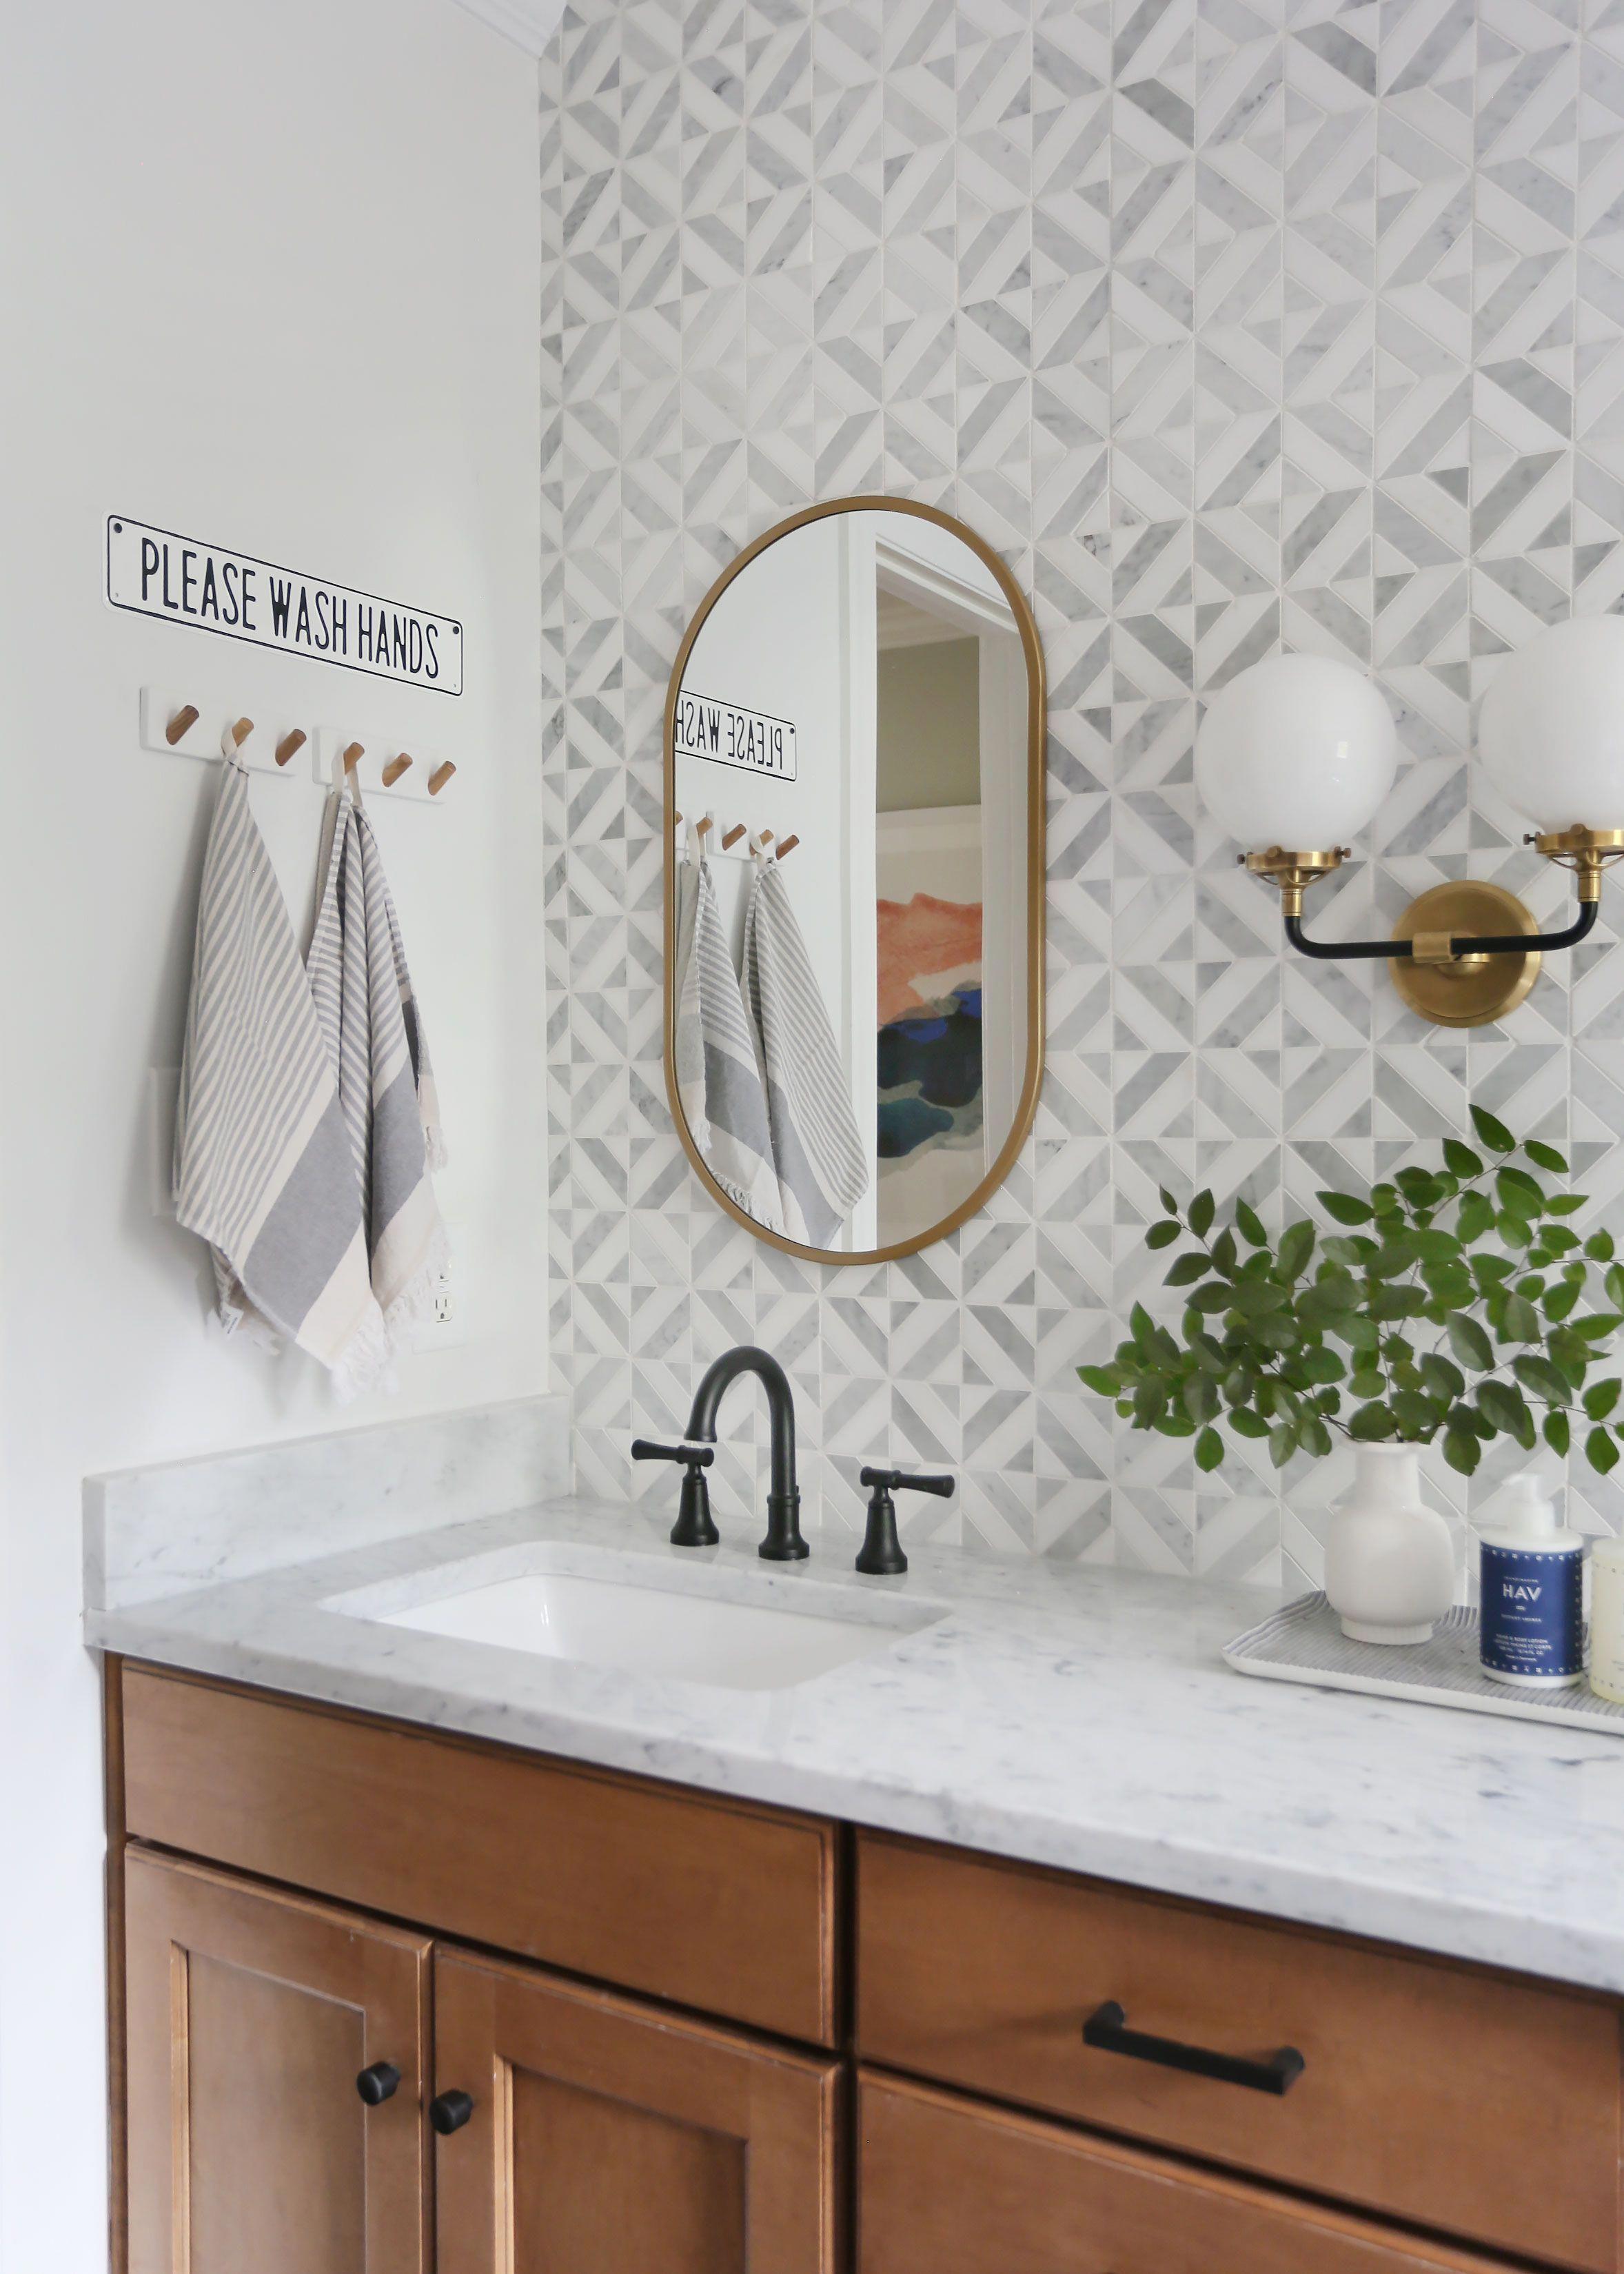 Photo of Reveal the matt black bathroom tap